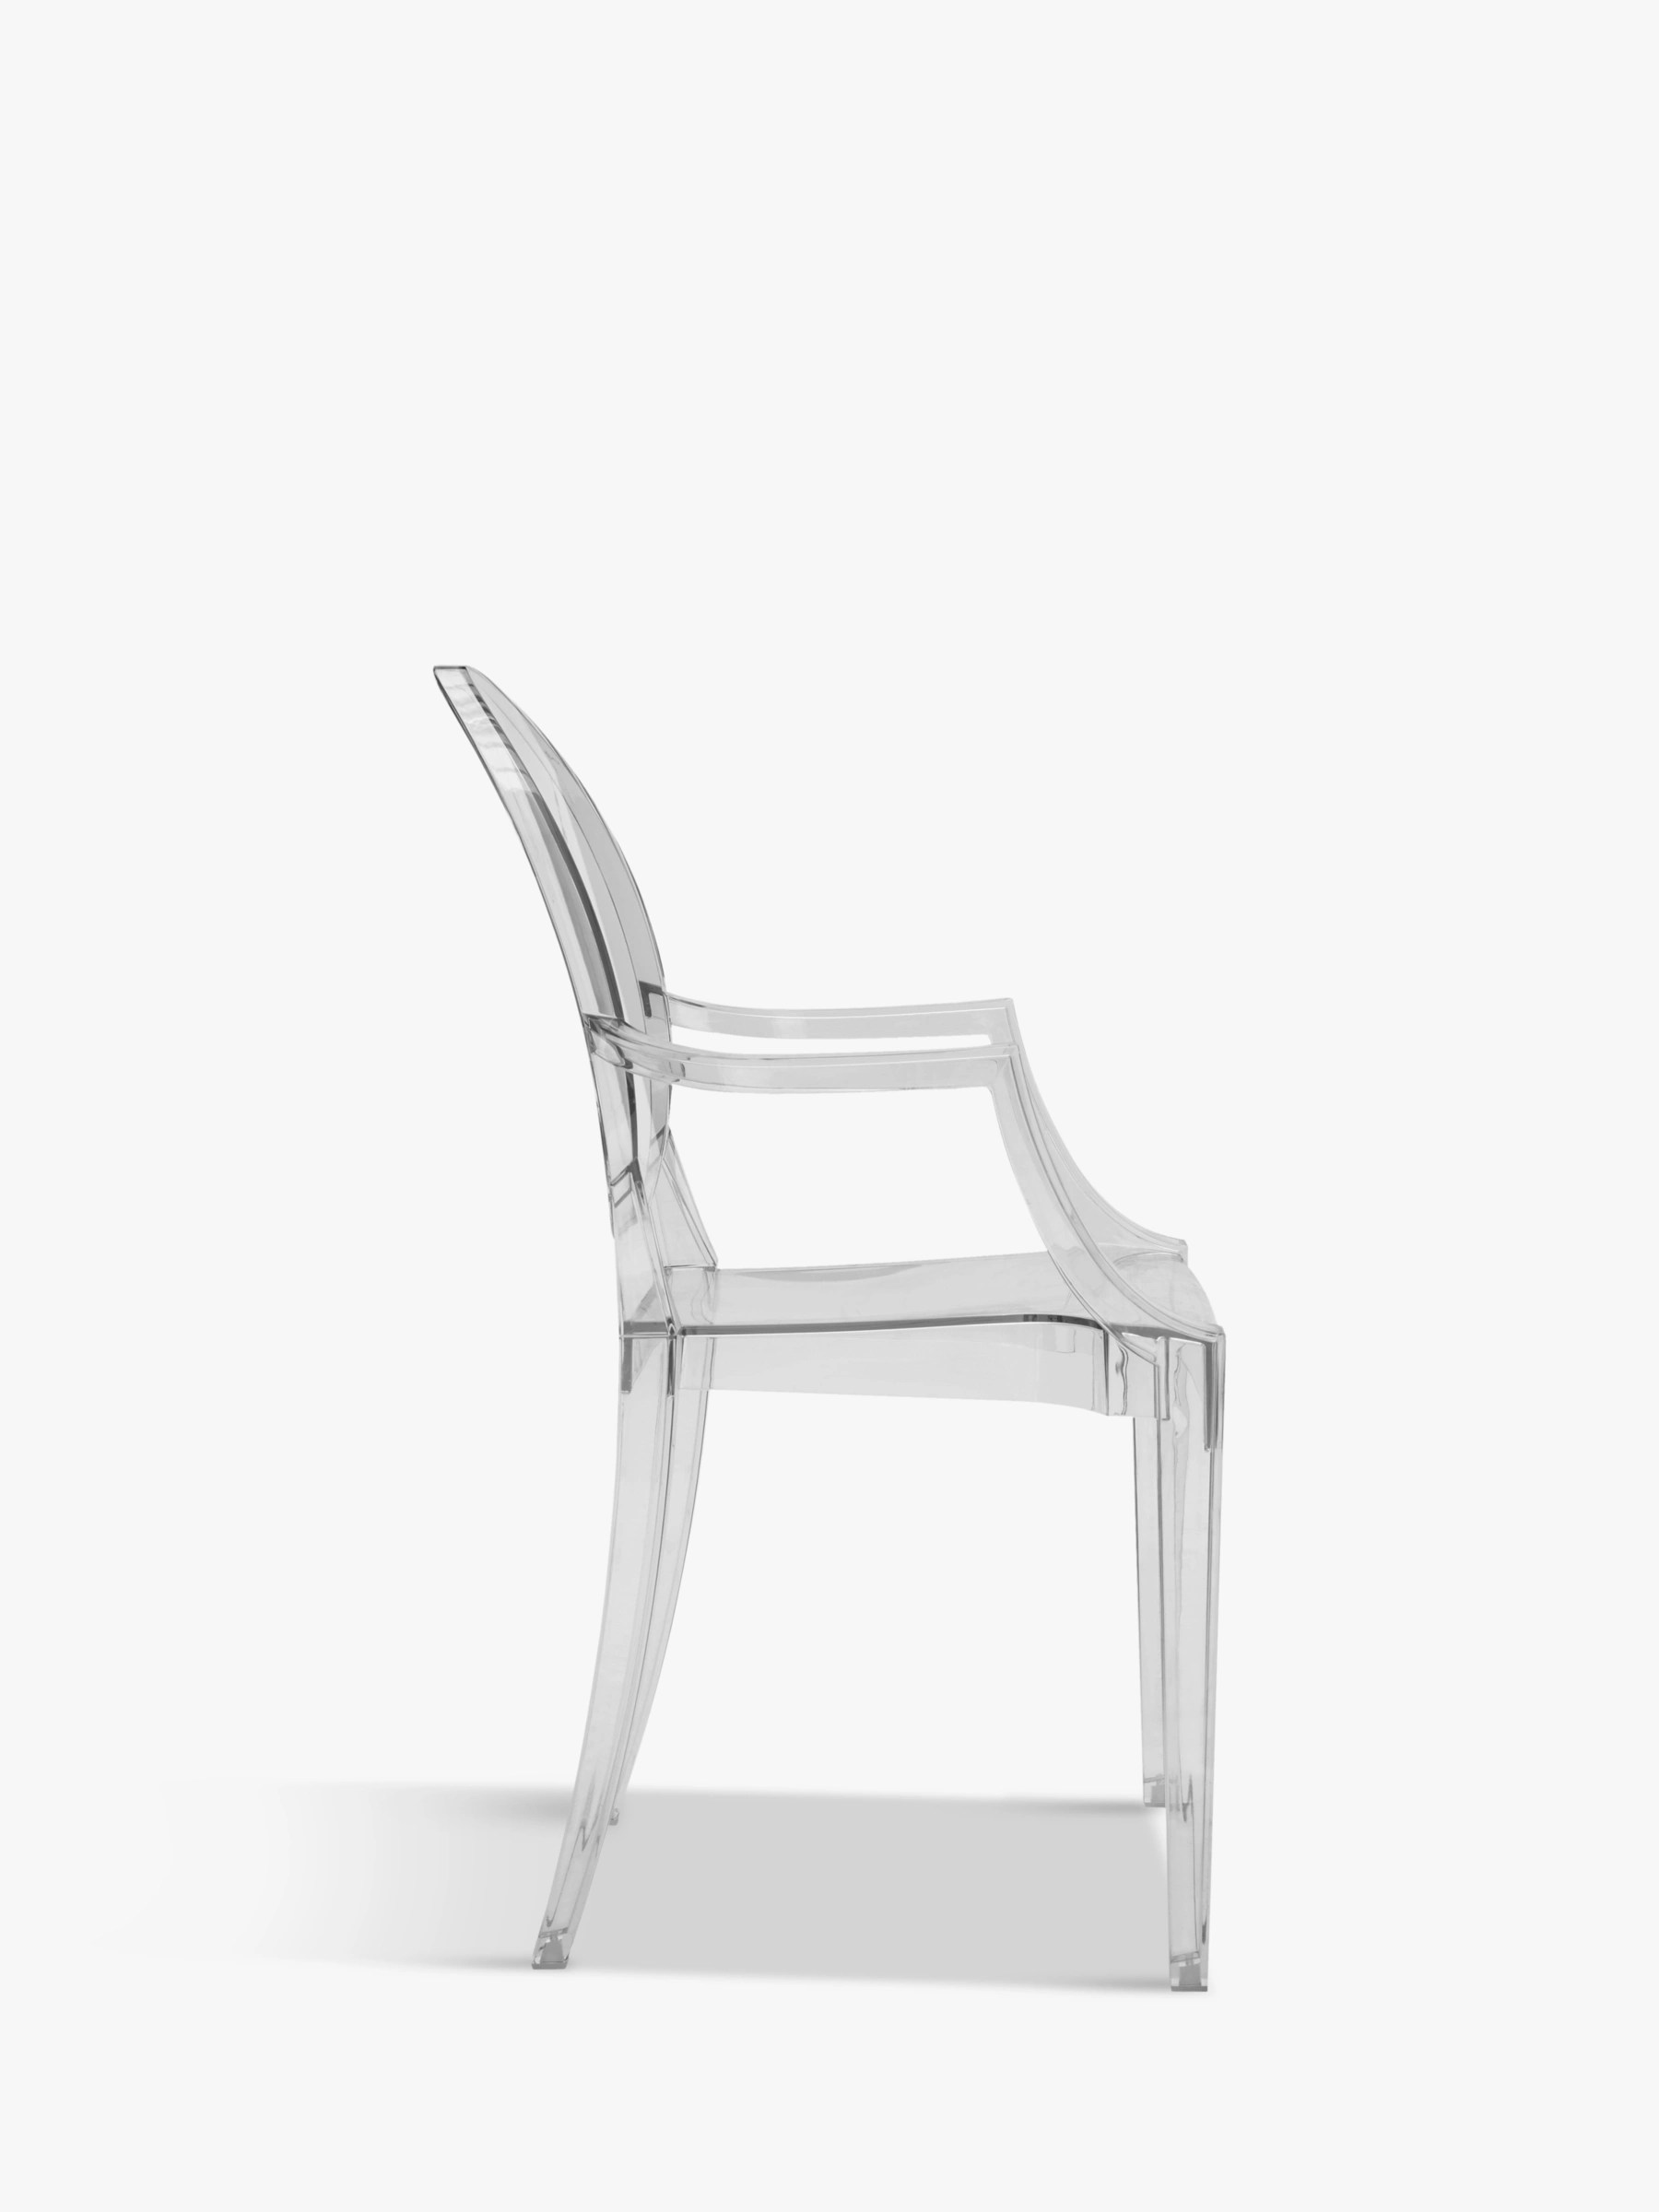 Buy Philippe Starck for Kartell Louis Ghost Chair  John Lewis